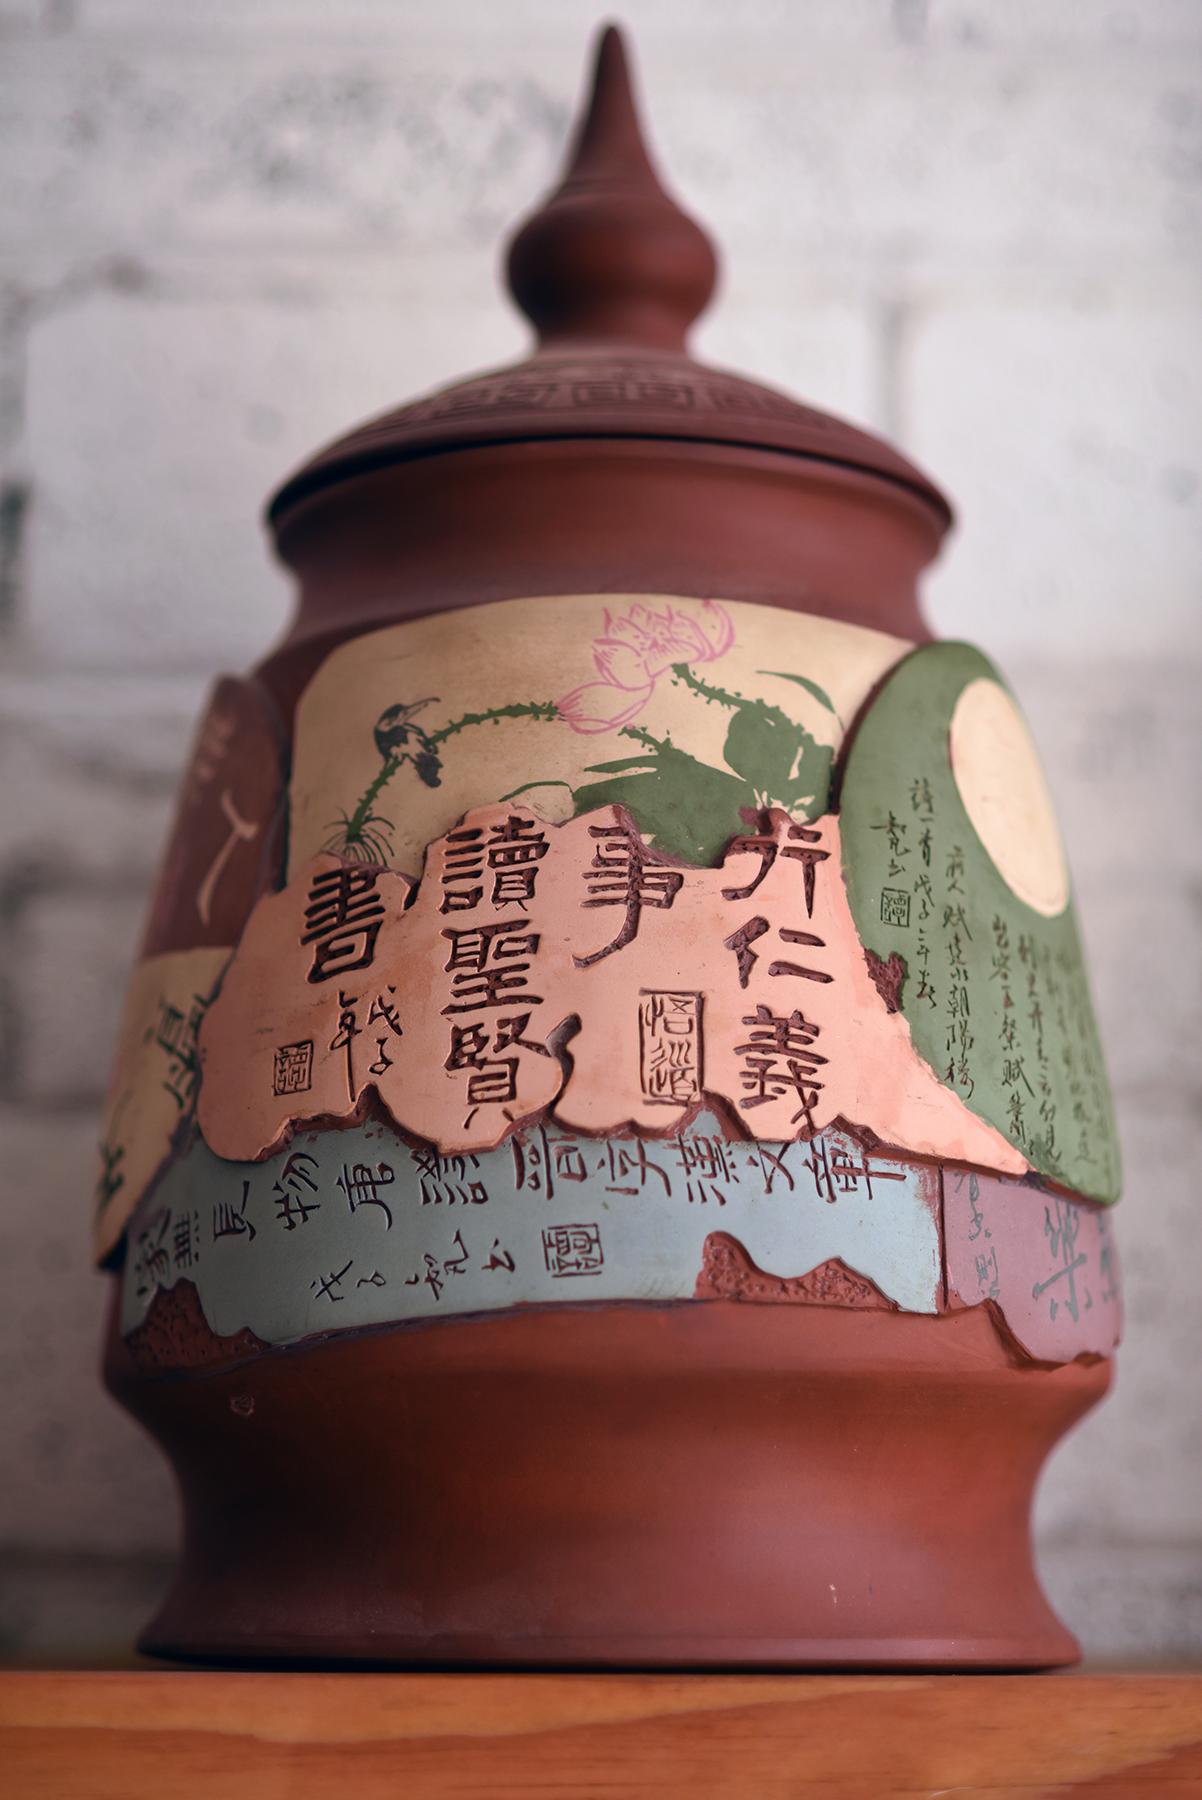 The work of Tan Zhi Fan,Inheritor of Purple Pottery Intangible Cultural Heritage, Jianshui, Yunnan Province.